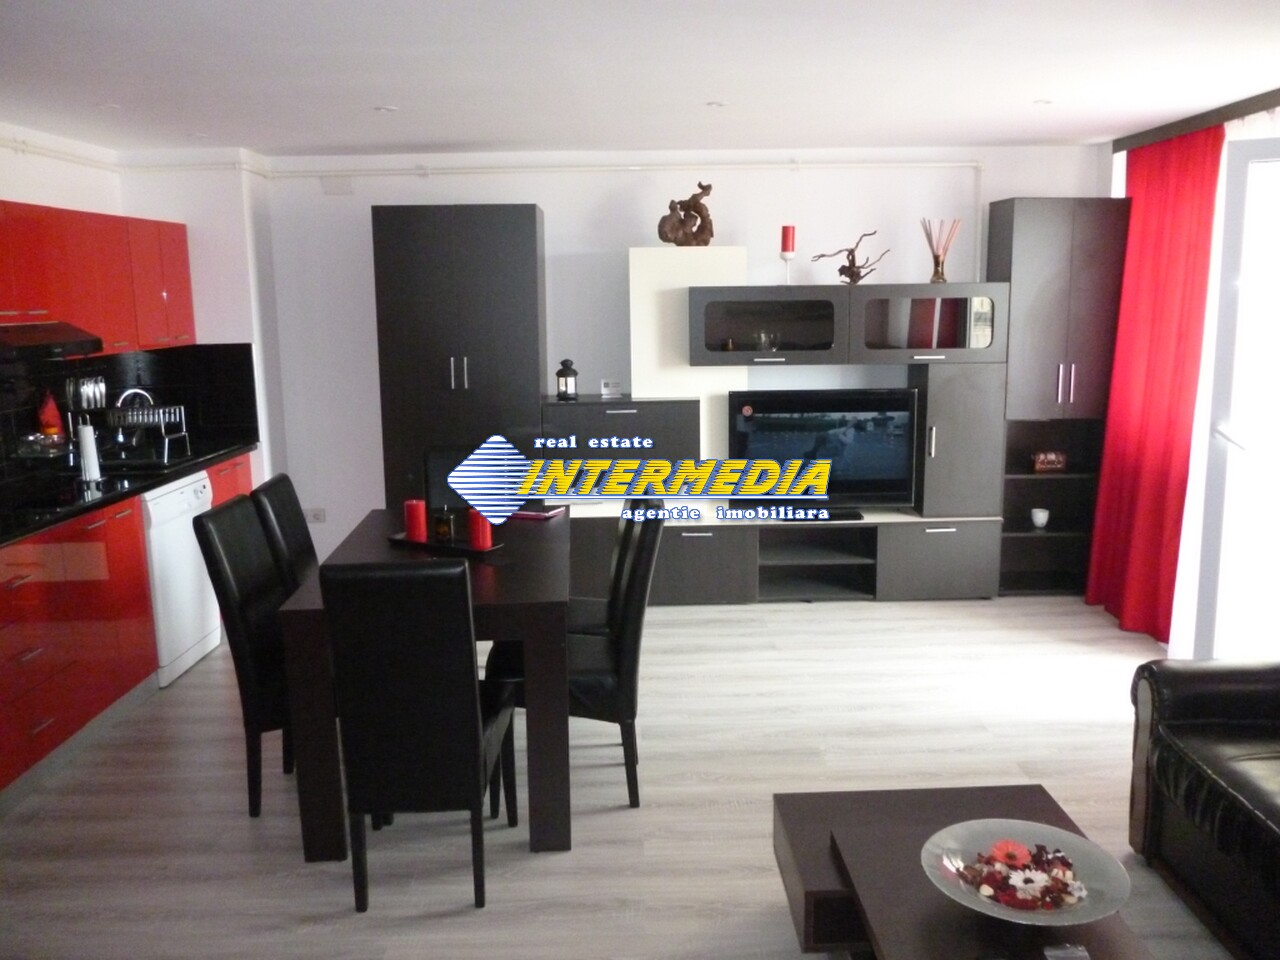 Apartament 4 camere de vanzare Alba Iulia Cetate Carolina 75.000 Euro-25931-0